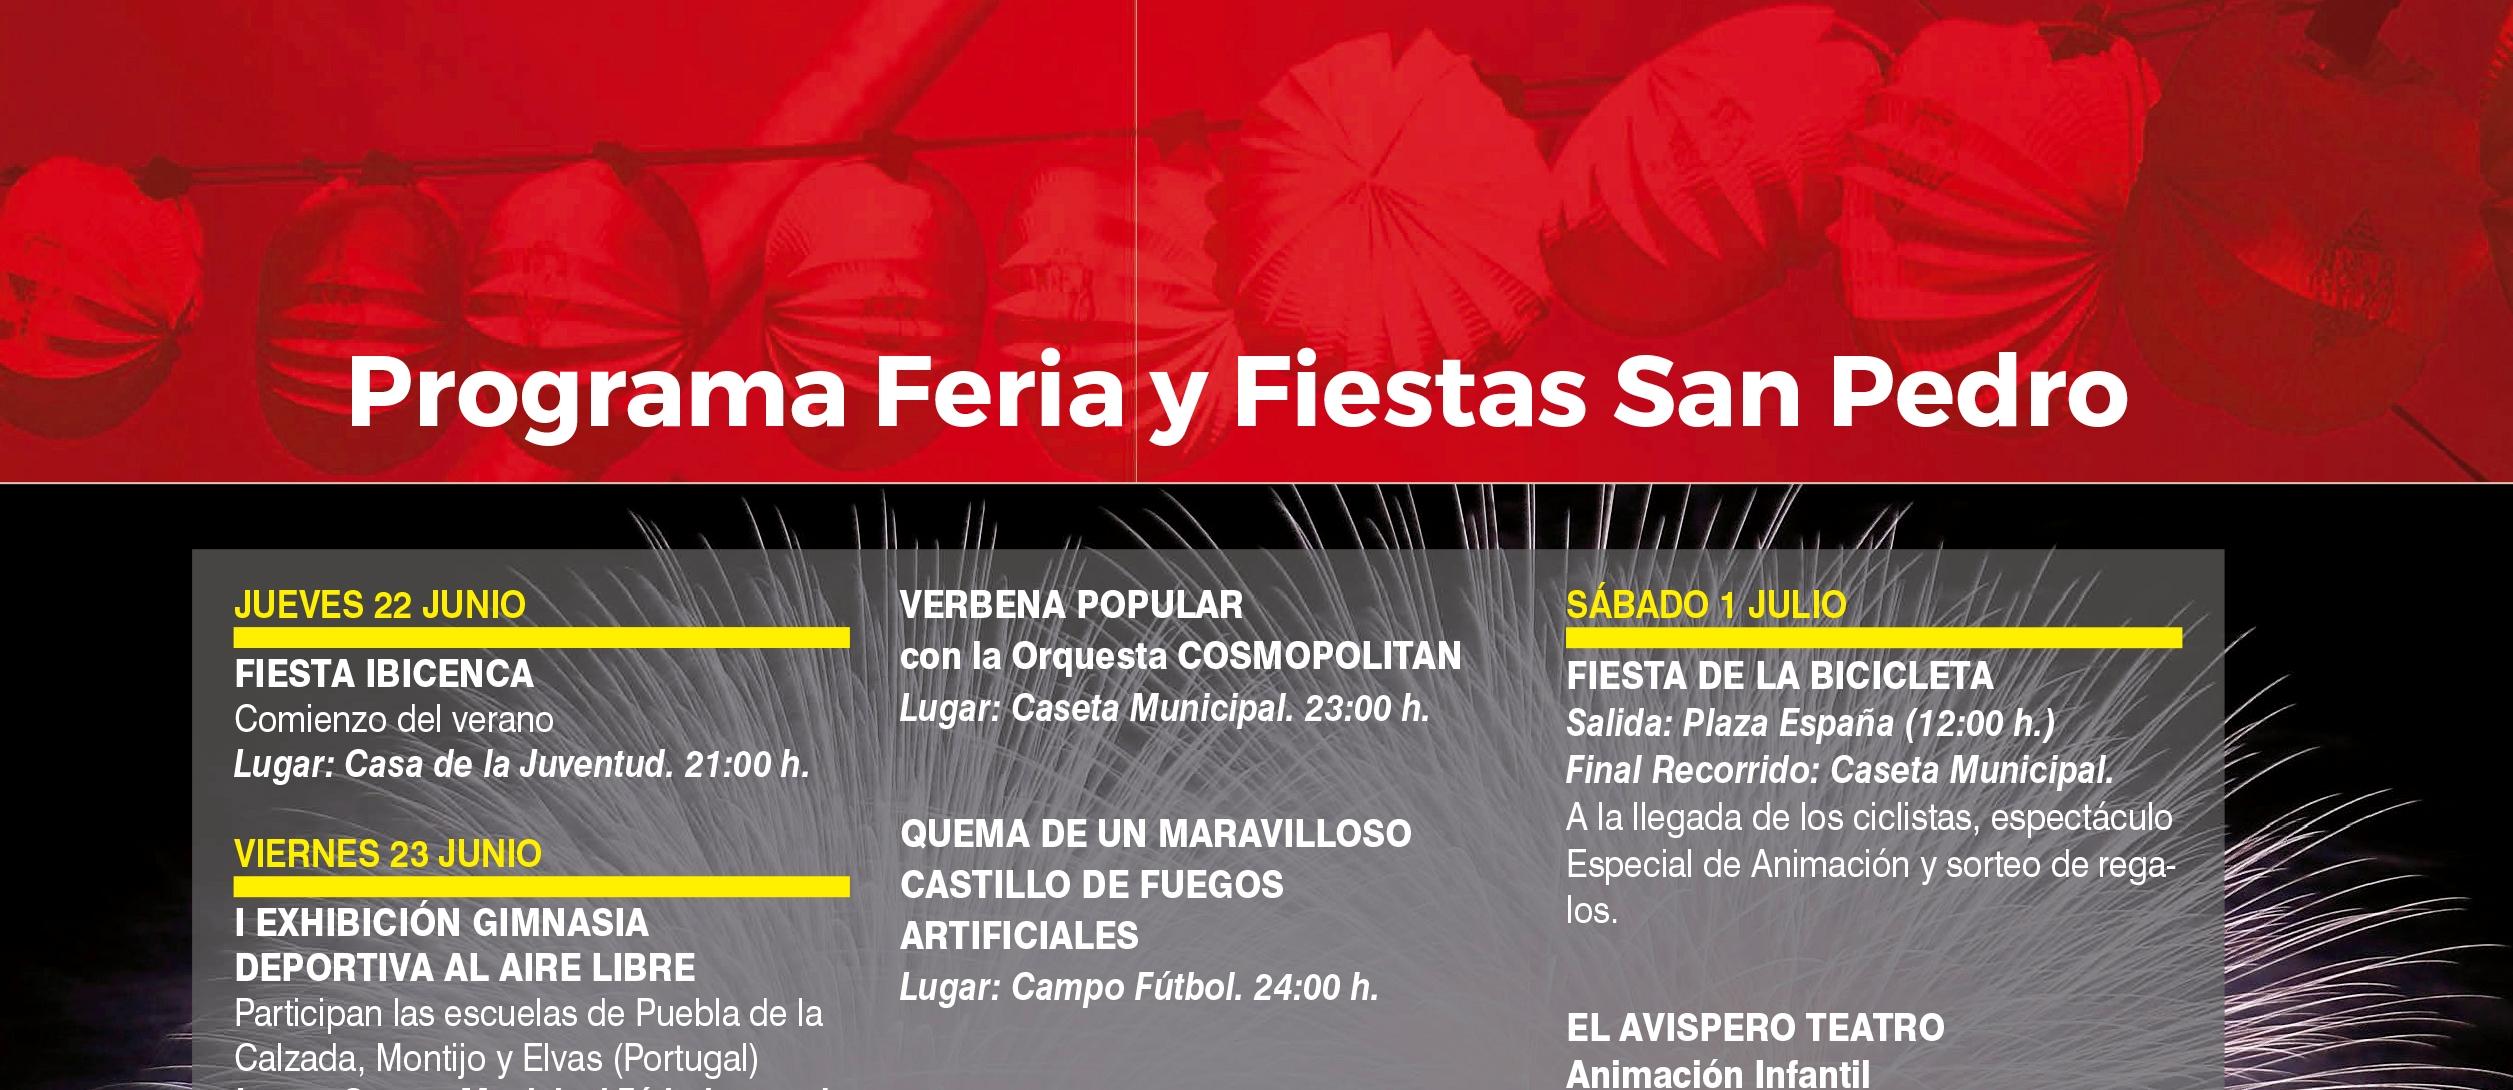 PROGRAMA DE FERIA Y FIESTAS SAN PEDRO 2017